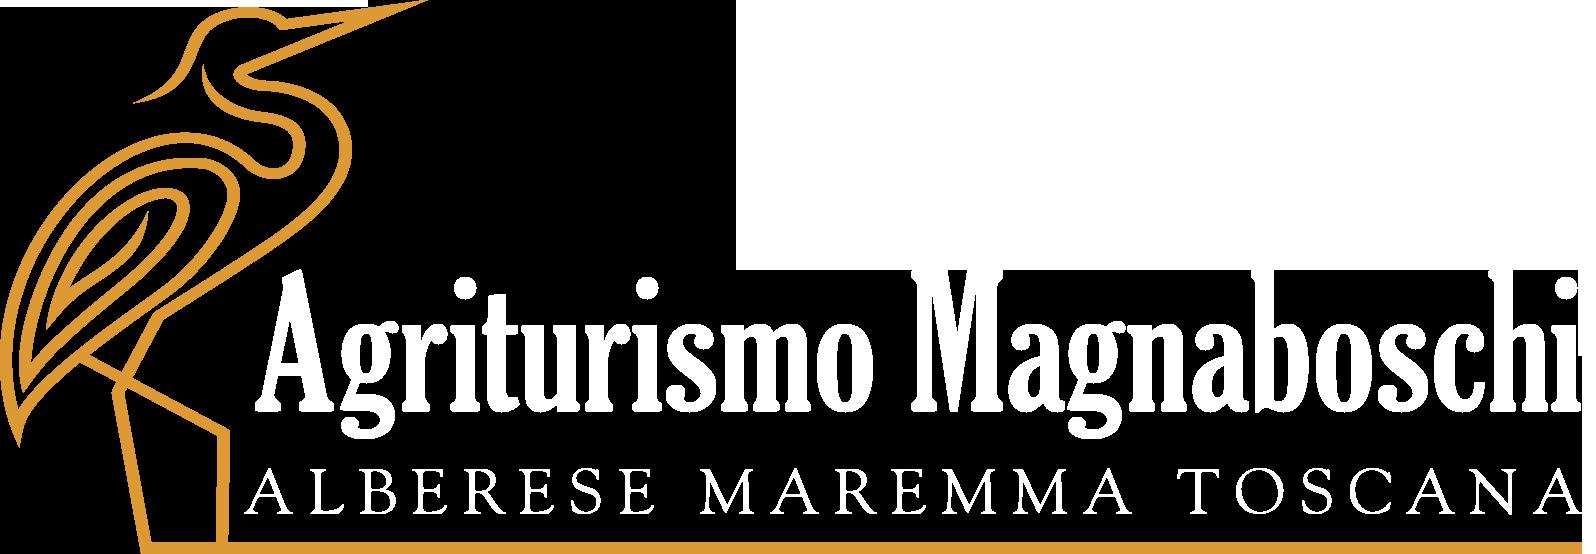 LOGO Agriturismo Magnaboschi Agriturismo Alberese con Piscina vicino al Mare, Maremma Toscana